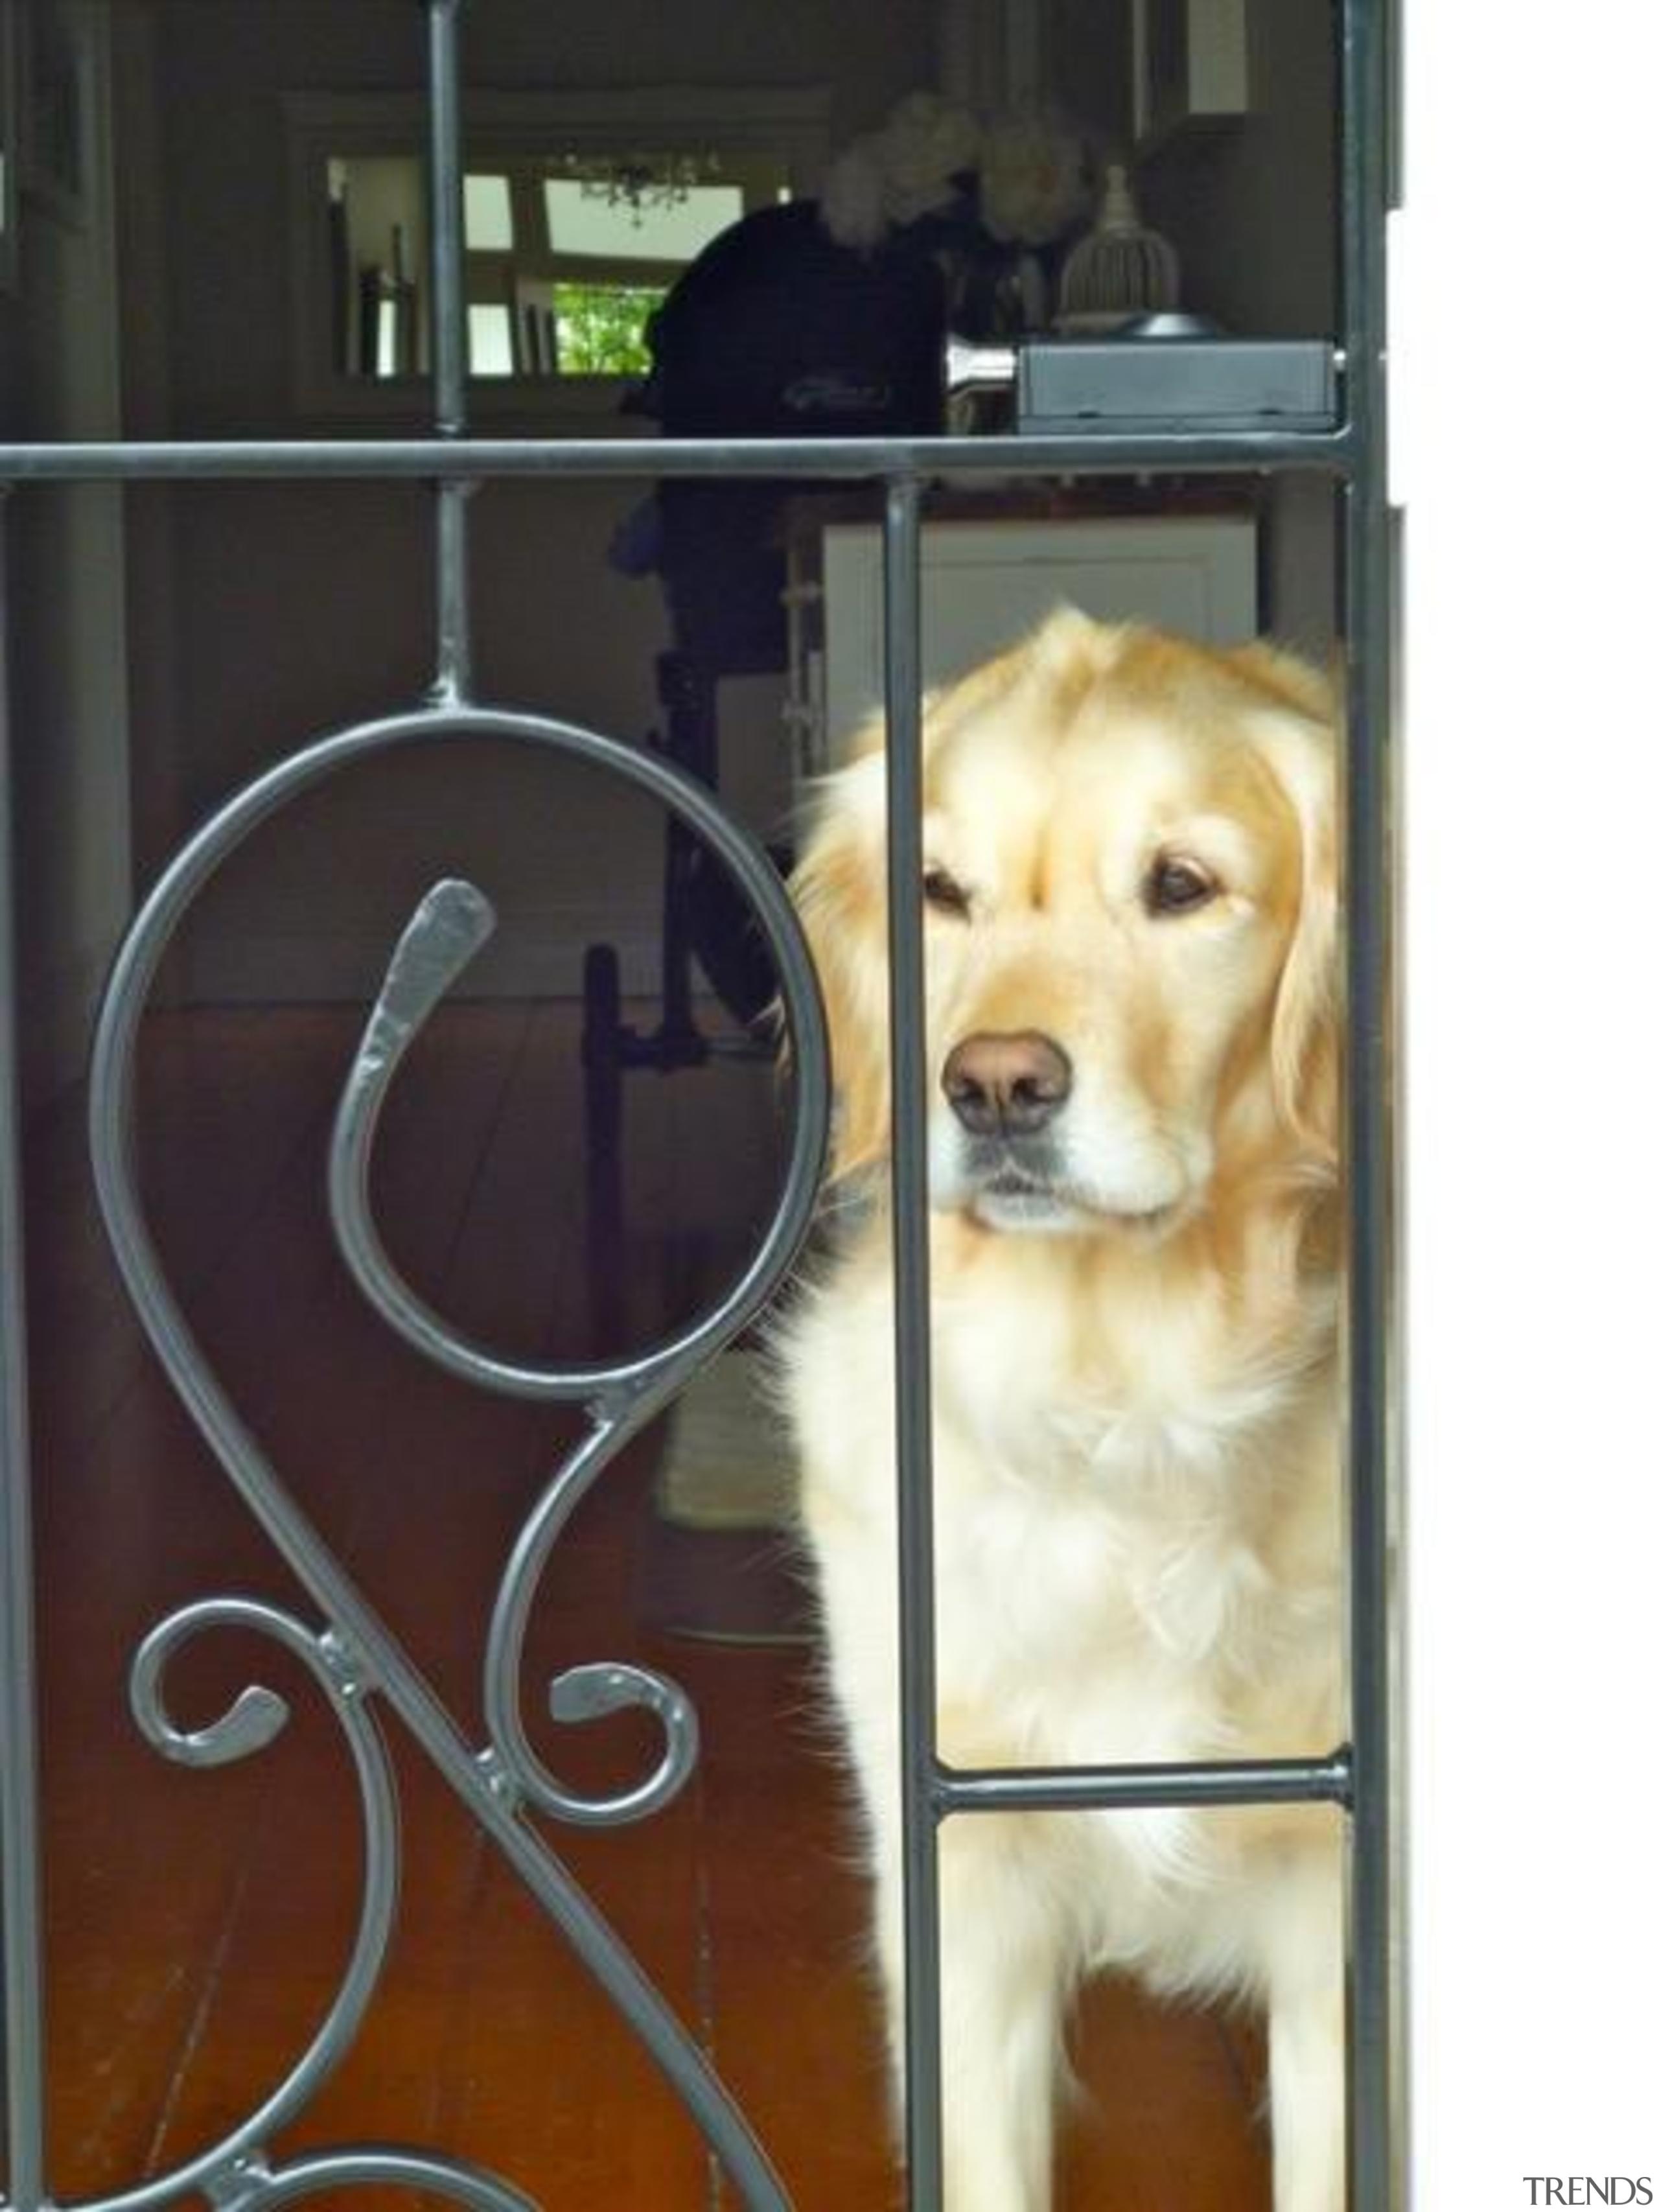 grdp1000260.jpeg - grdp1000260.jpeg - companion dog | dog companion dog, dog, dog breed, dog like mammal, golden retriever, puppy, retriever, snout, black, white